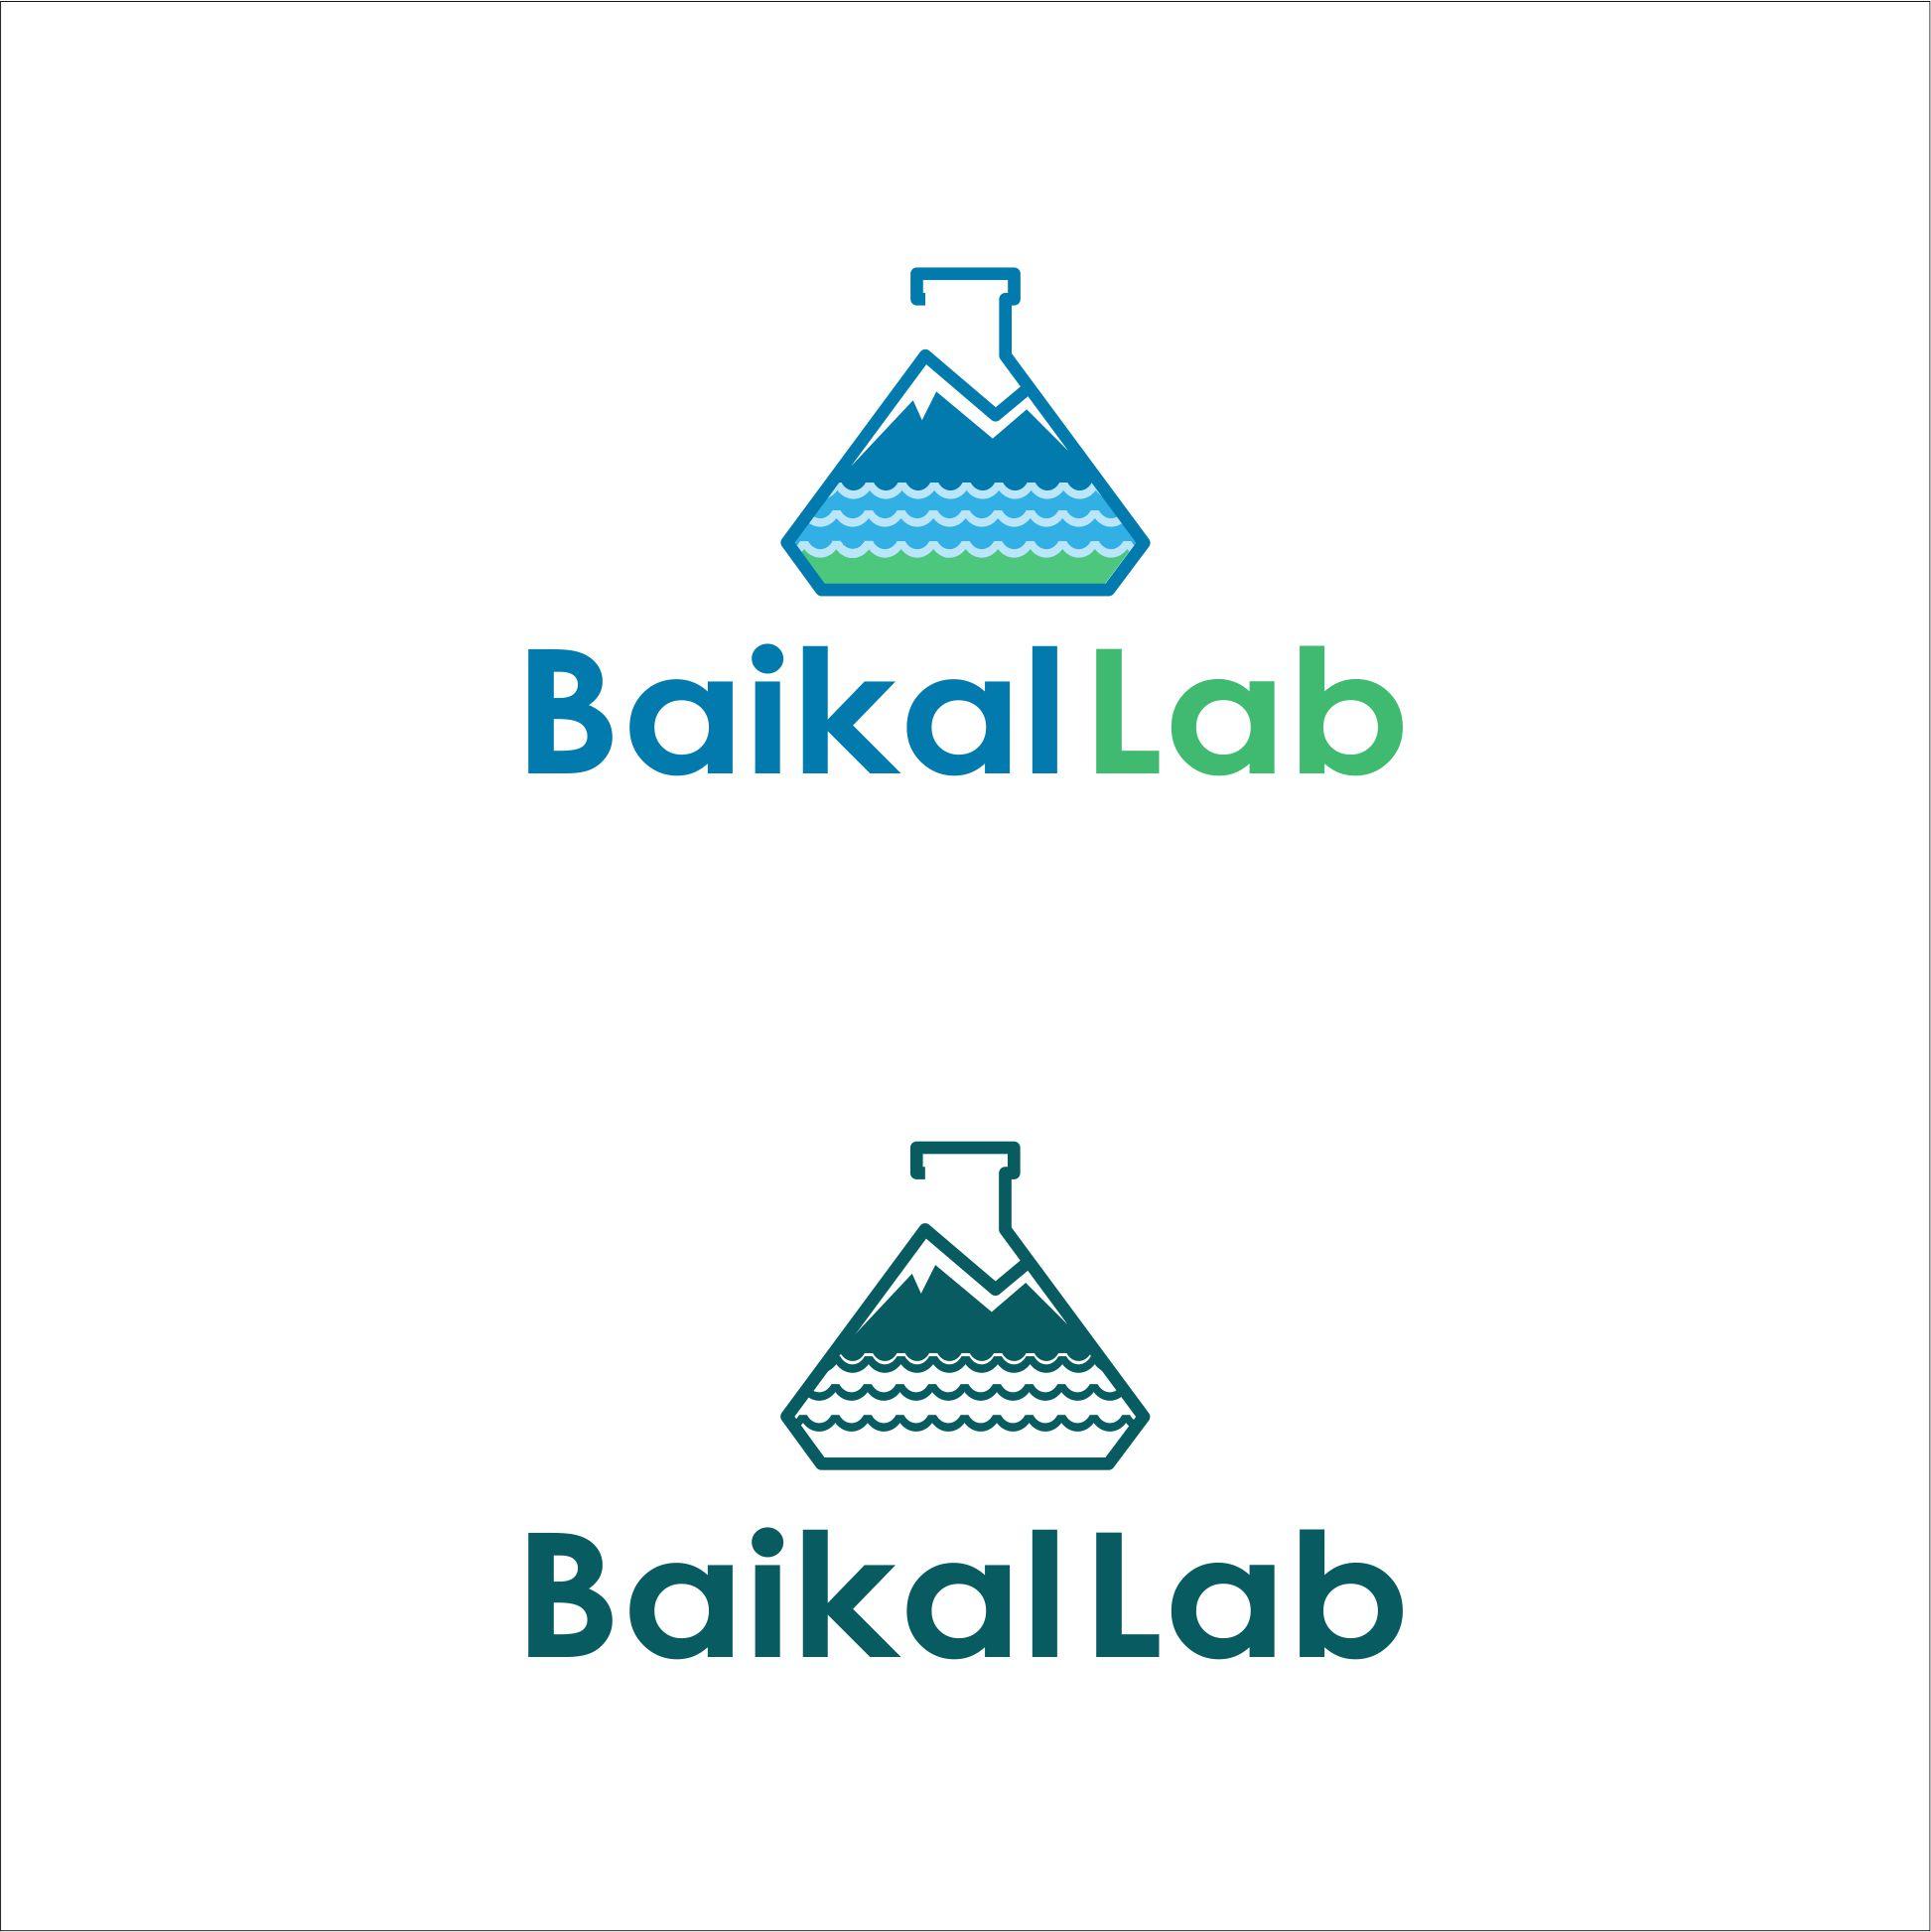 Разработка логотипа торговой марки фото f_2065969b4cf2d899.jpg